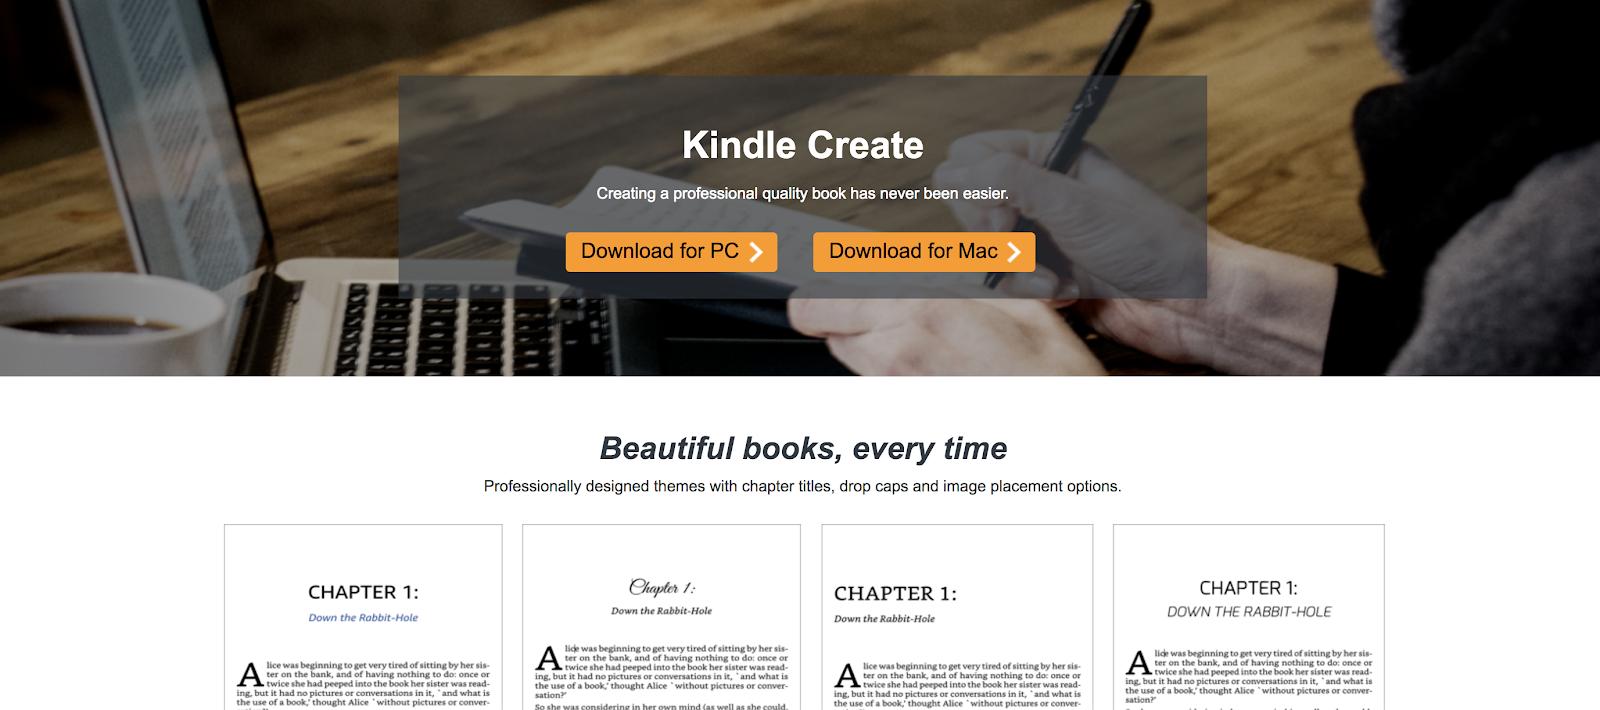 Amazon Kindle Create (eBook Publishing) Screenshot of Instructions